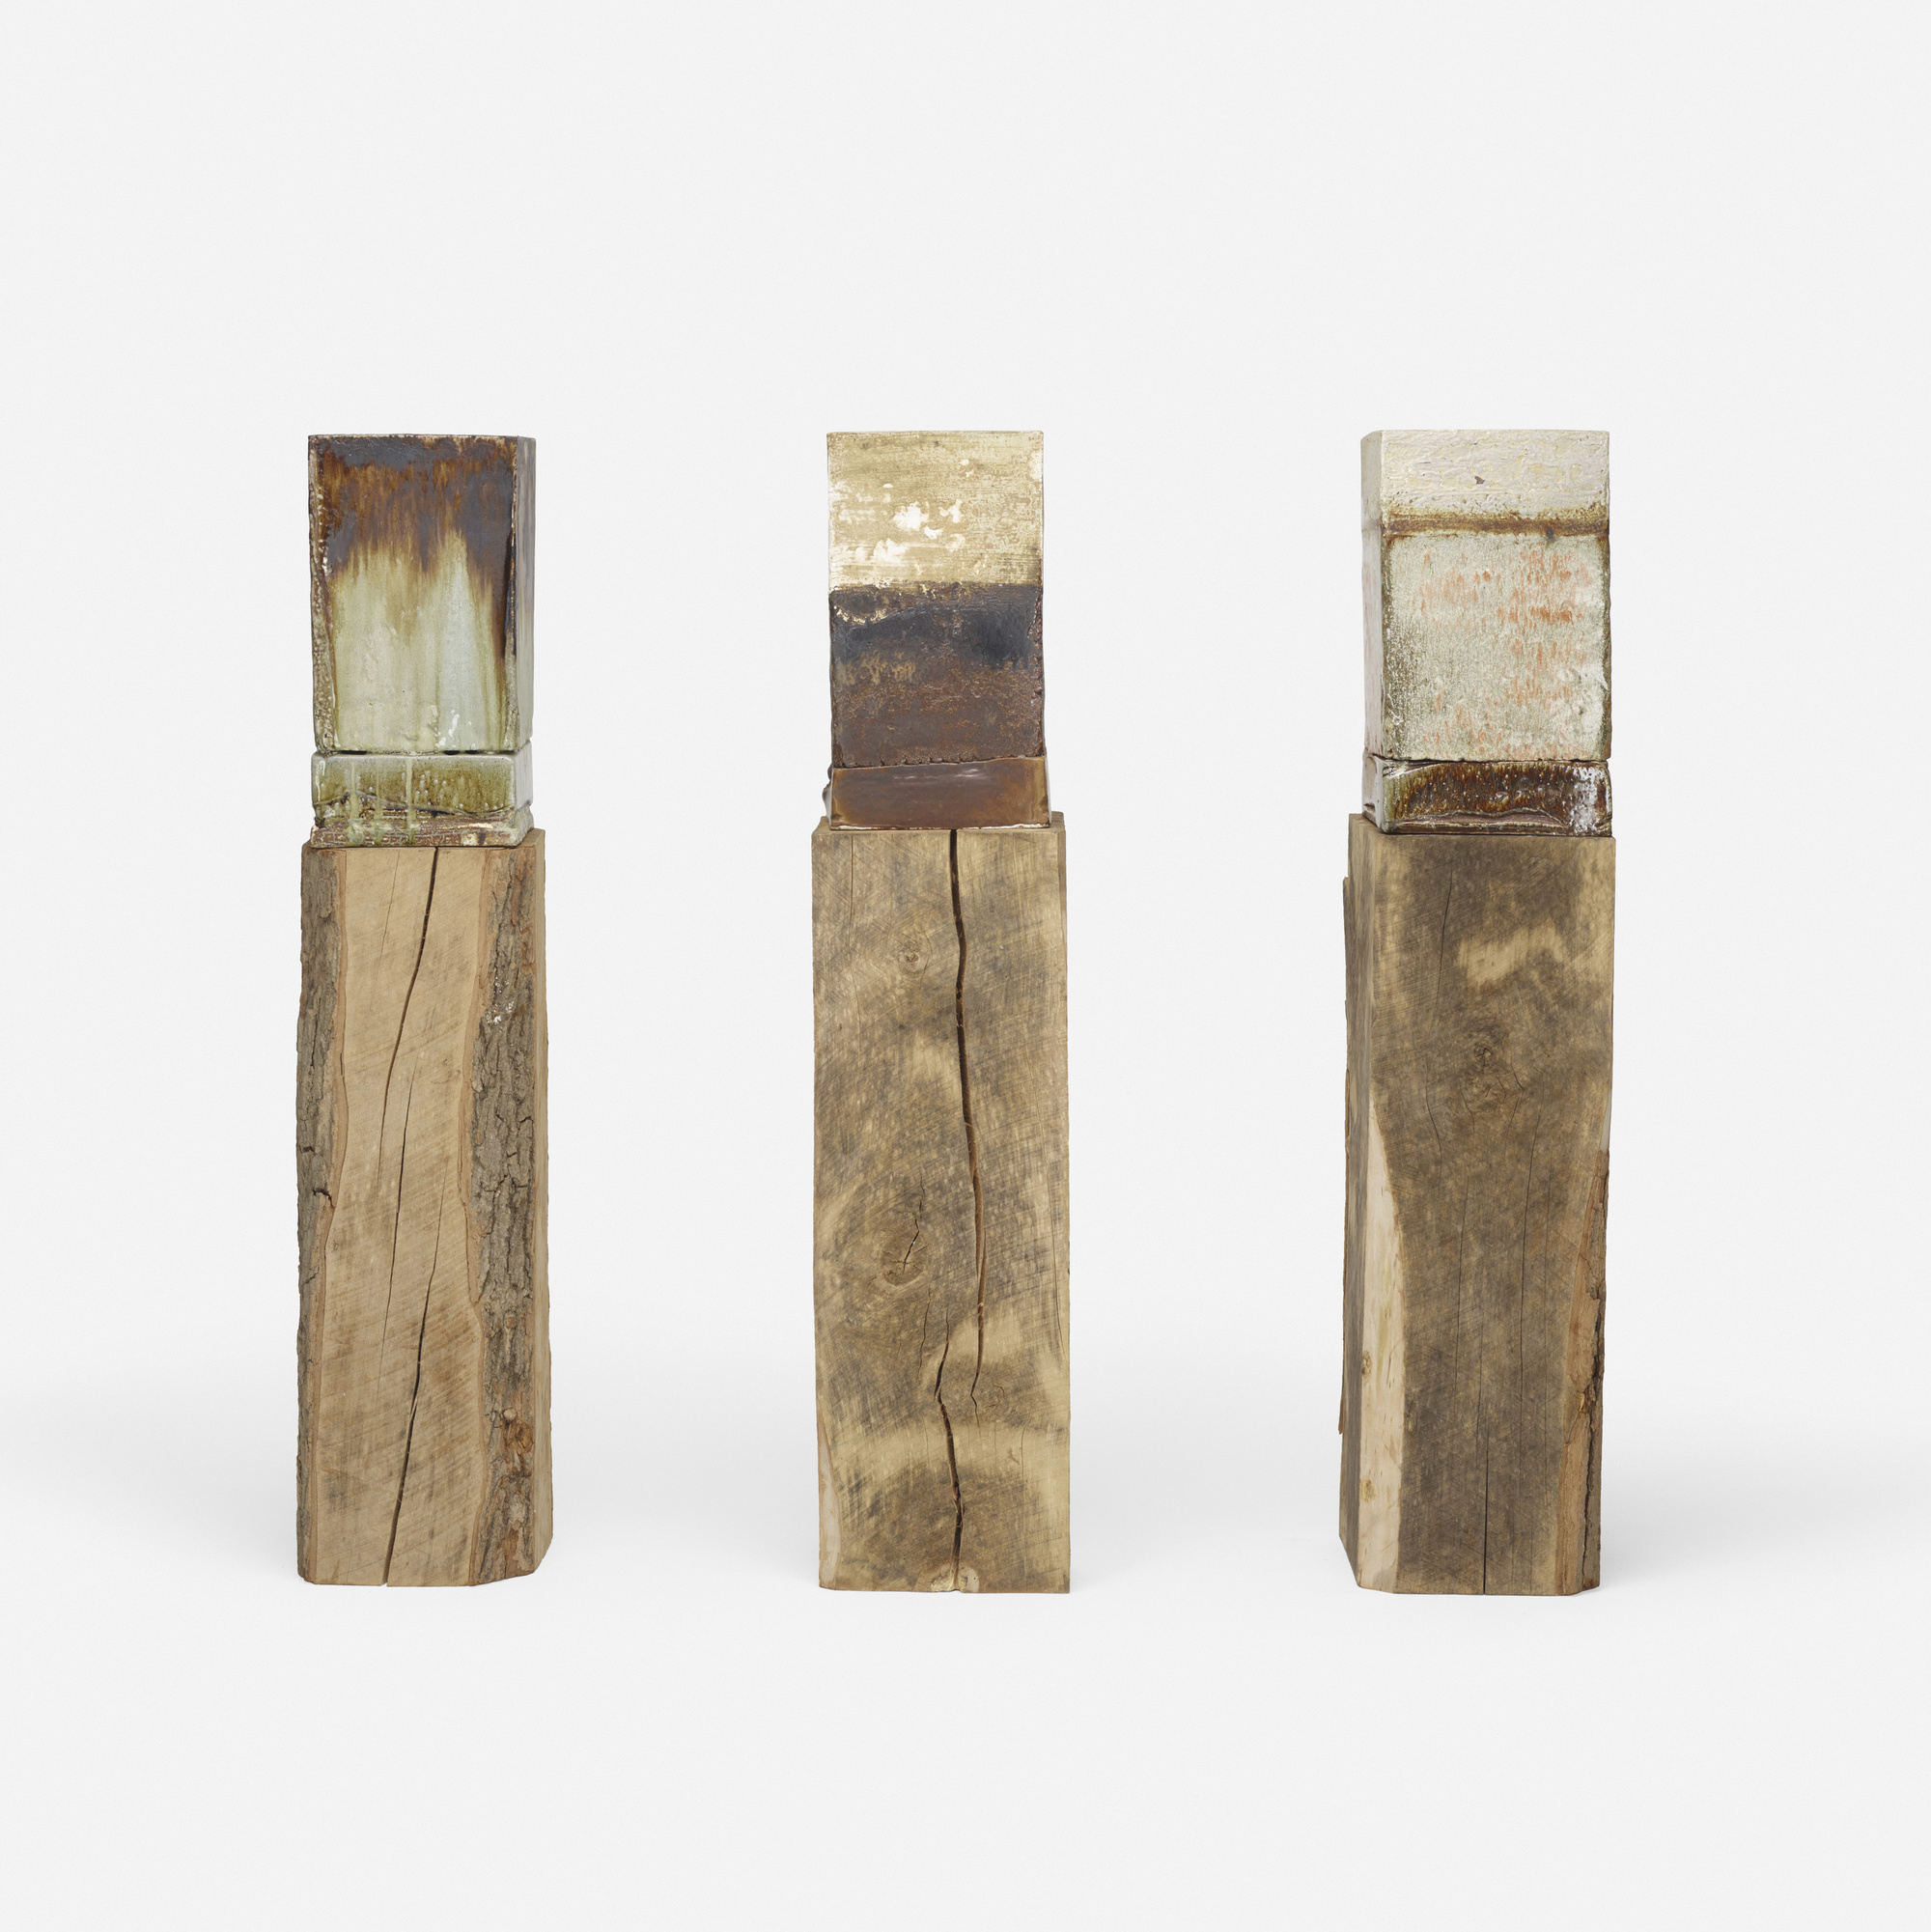 247: Tetsuya Yamada / Untitled (three works) (2 of 3)